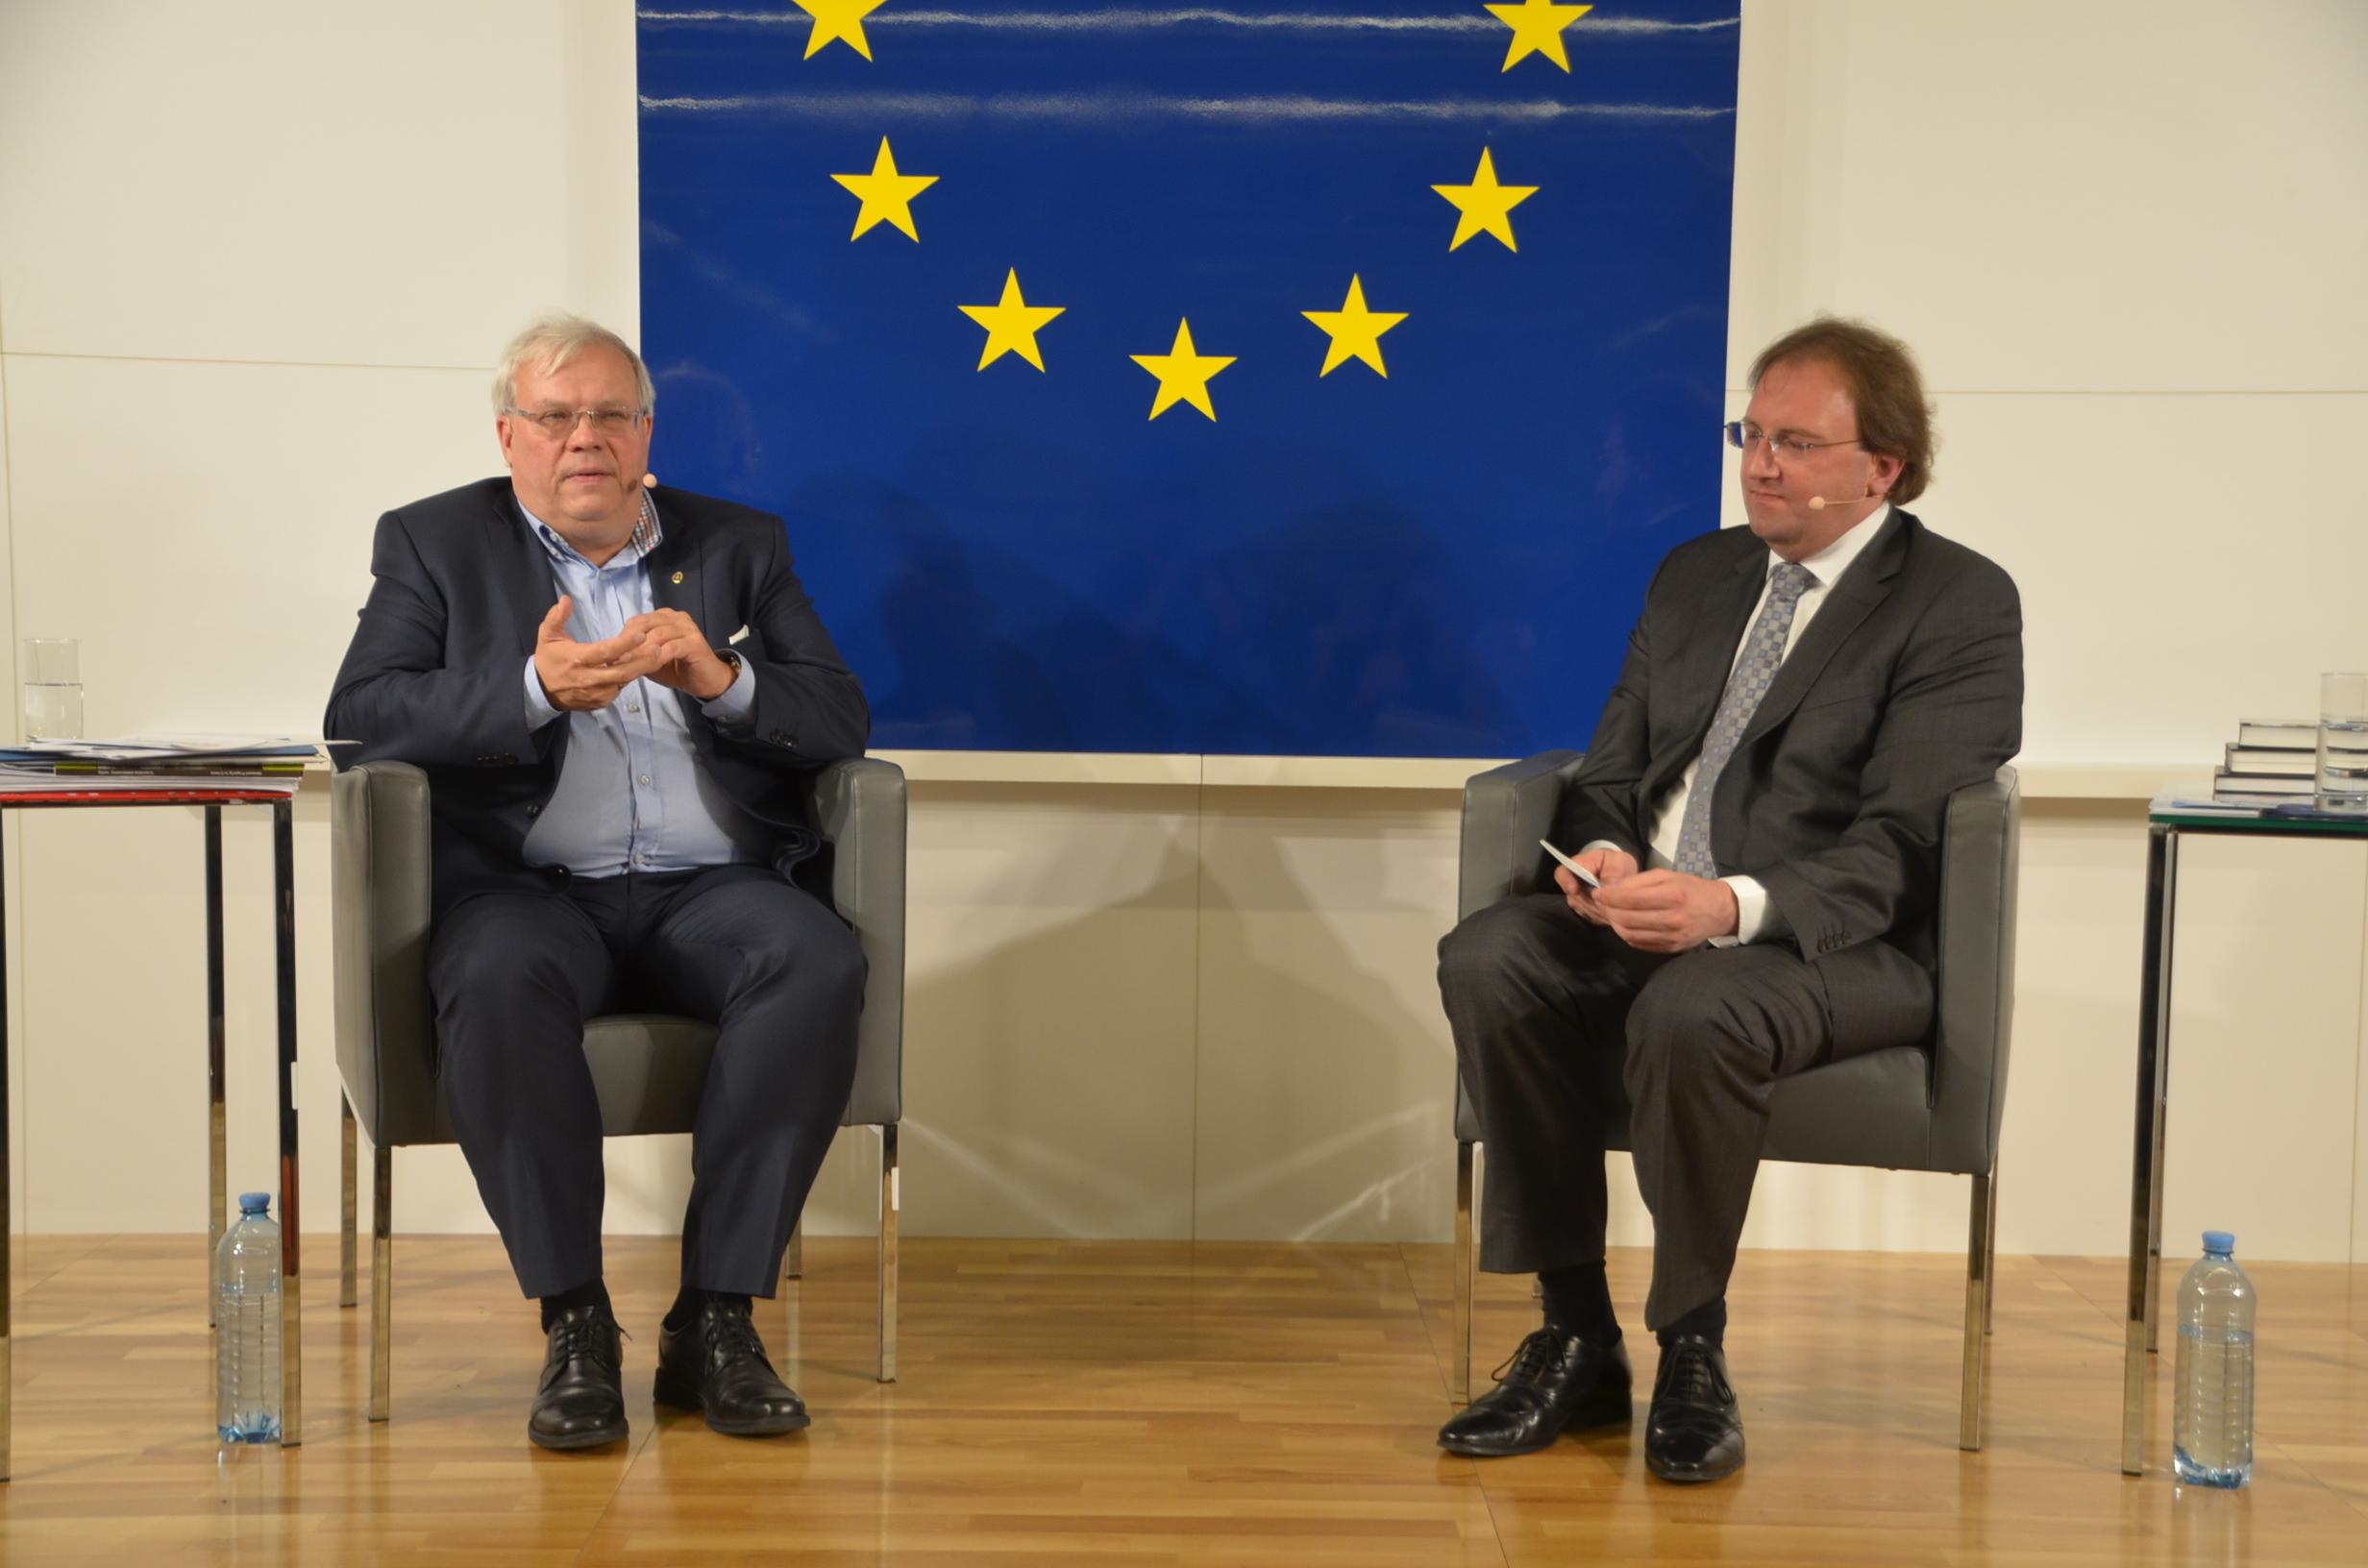 europadialog_christian-wehrschuetz_a10_30149013332_o__credit_european-commission